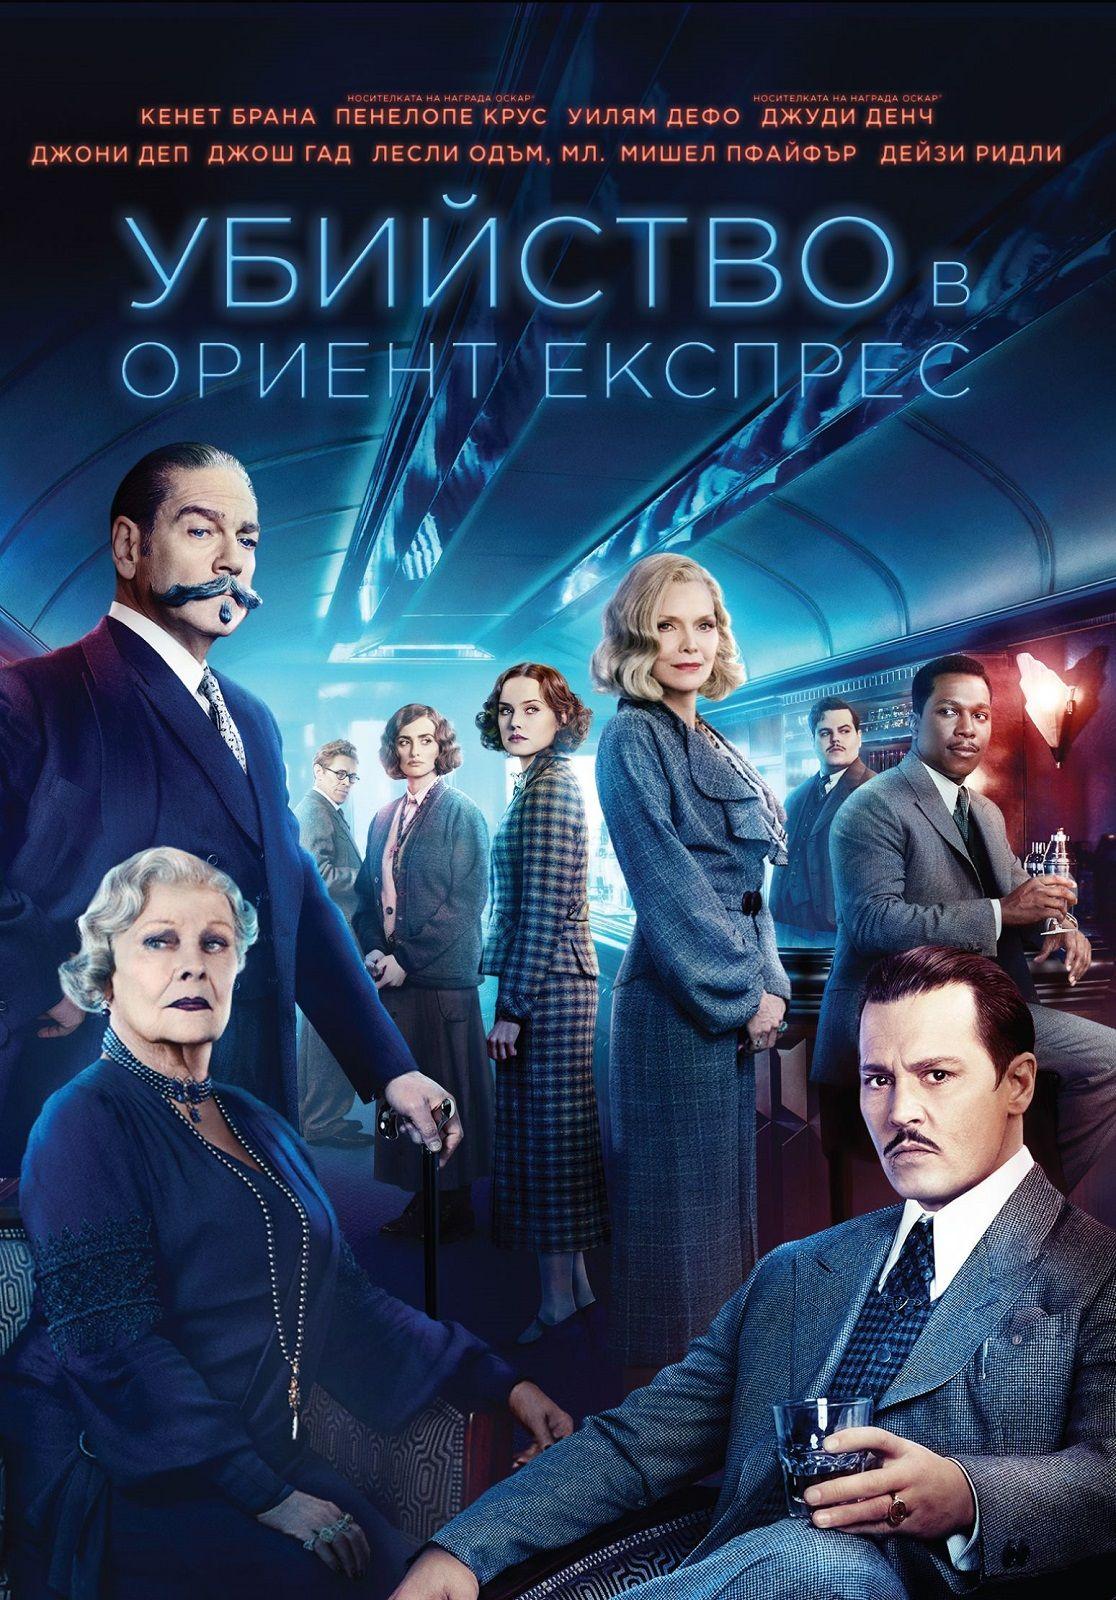 Убийство в Ориент експрес (DVD) - 1